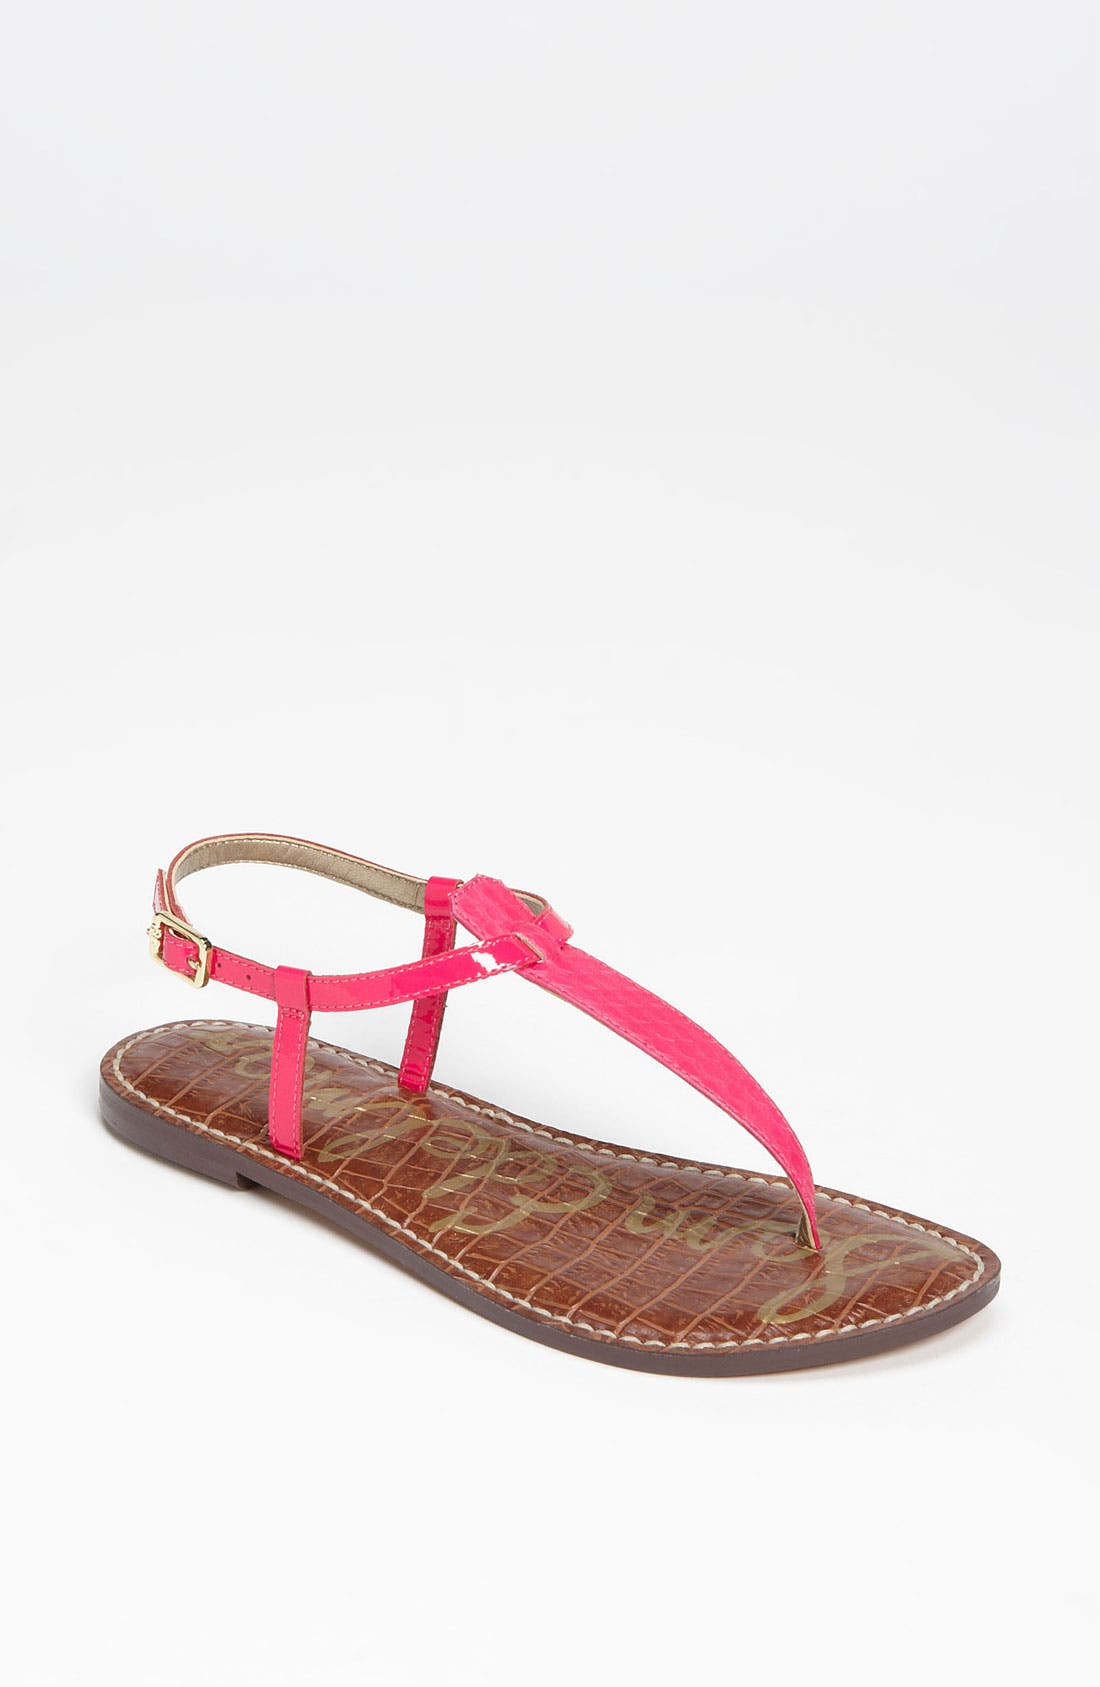 Main Image - Sam Edelman 'Gigi' Sandal (Women) (Exclusive Color)